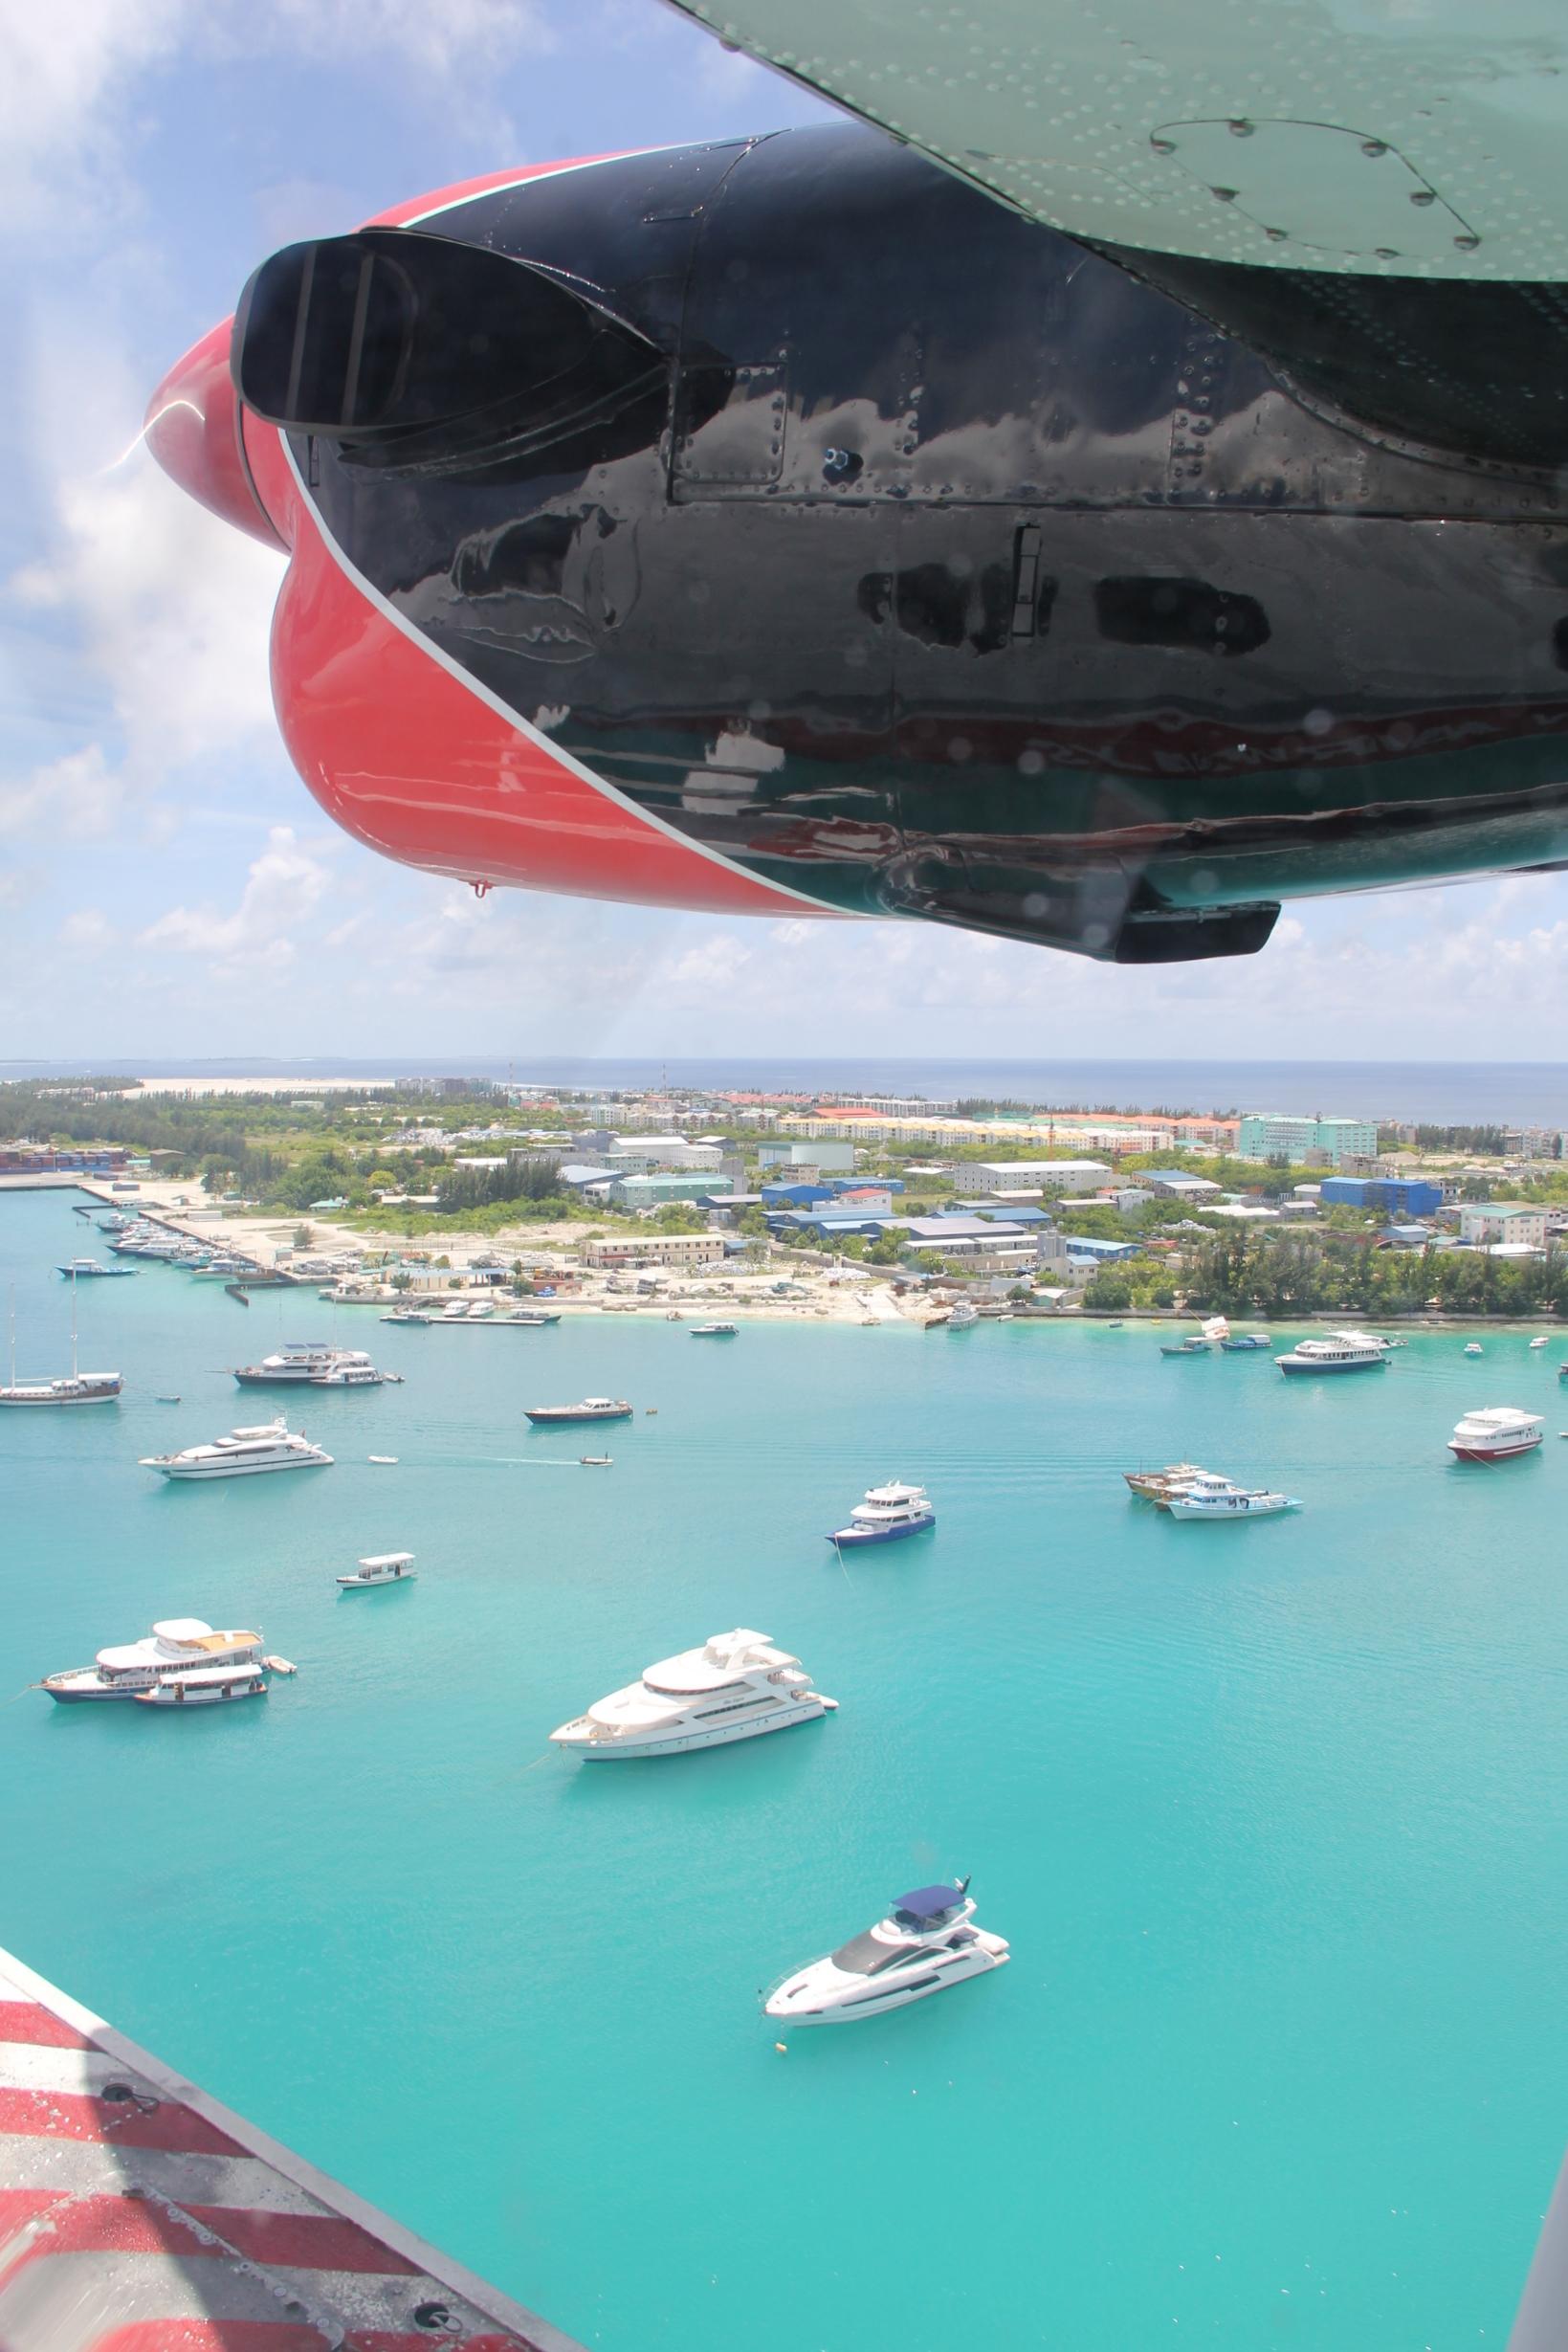 Beyond Ordinary Guides - Sea Plane ride in the Maldives